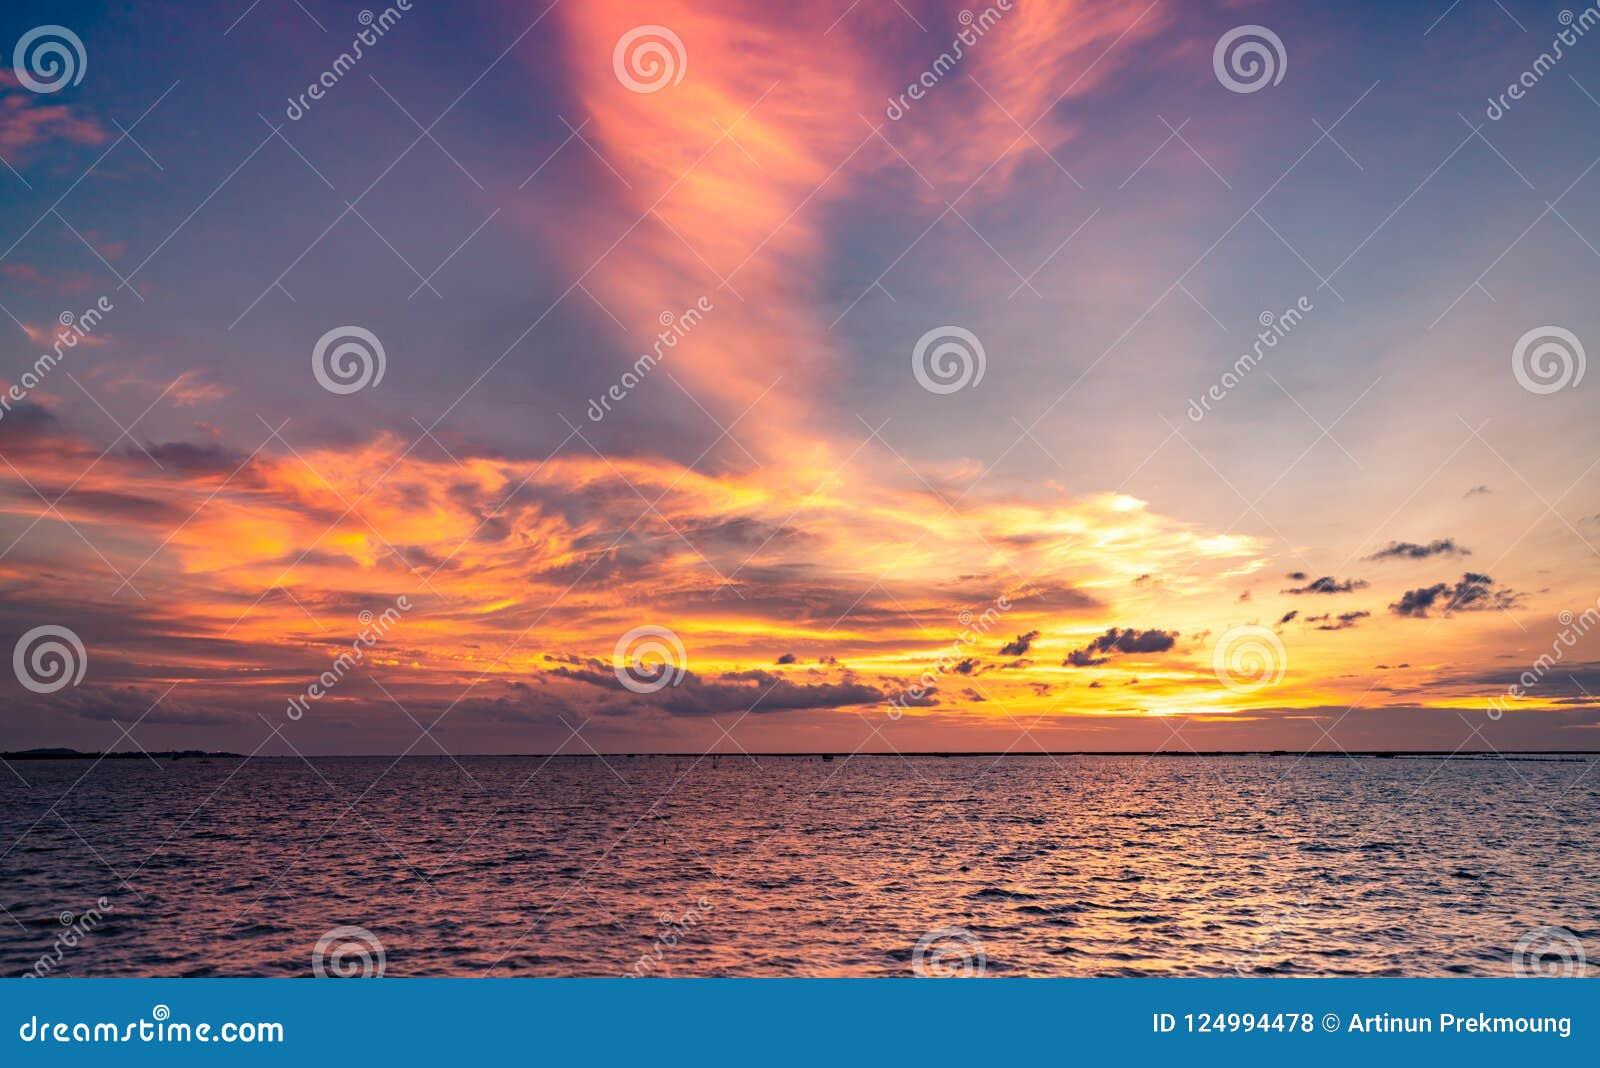 Beautiful Sunset Sky Beach Sunset Twilight Sea And Sky Tropical Sea At Dusk Dramatic Orange And Blue Sky Calm Sea Sunset Stock Photo Image Of Morning Clouds 124994478 Wallpaper hills sunset sky sea golden